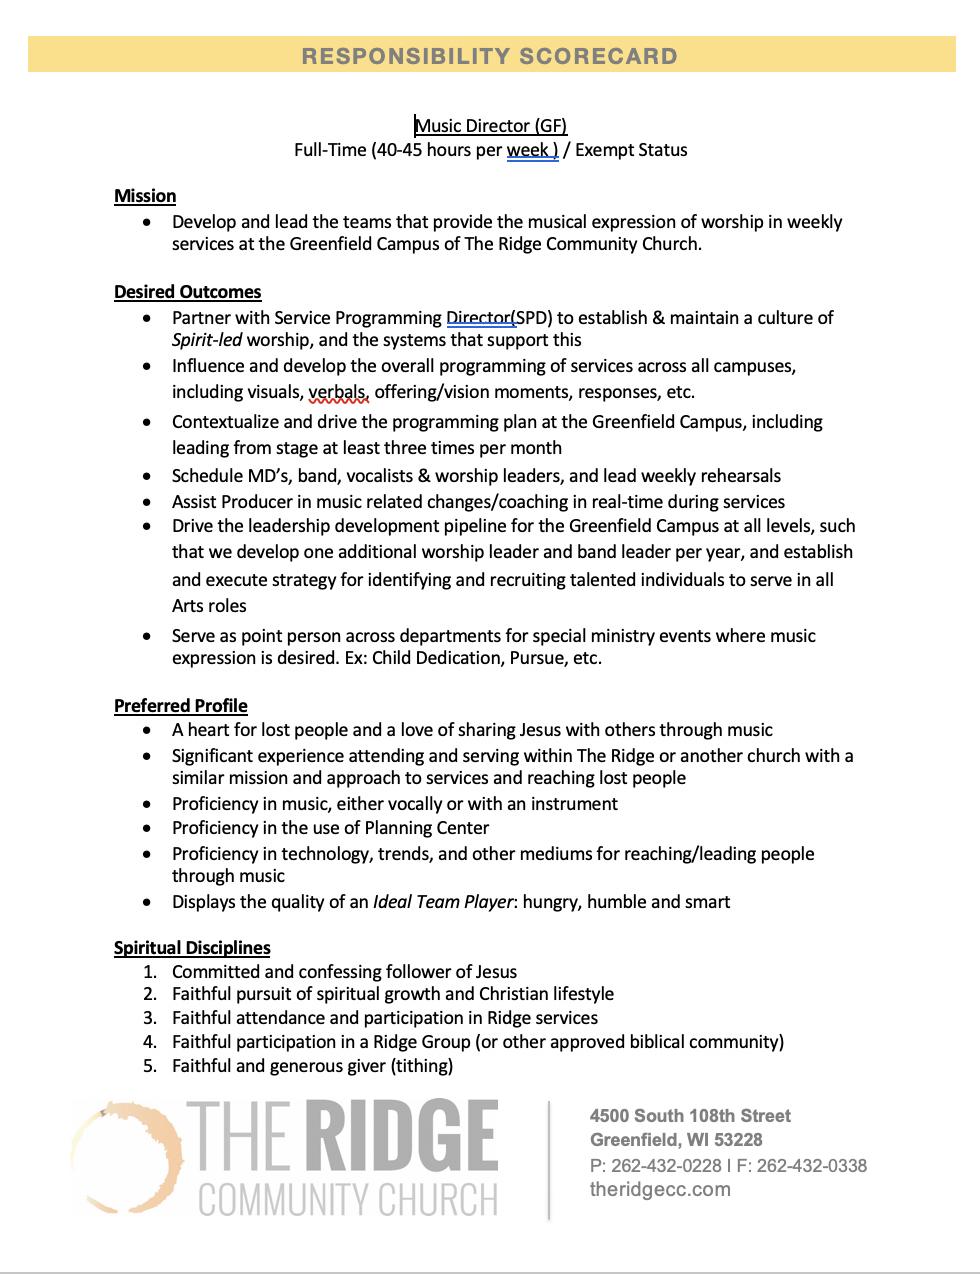 TRCC Job Description.png